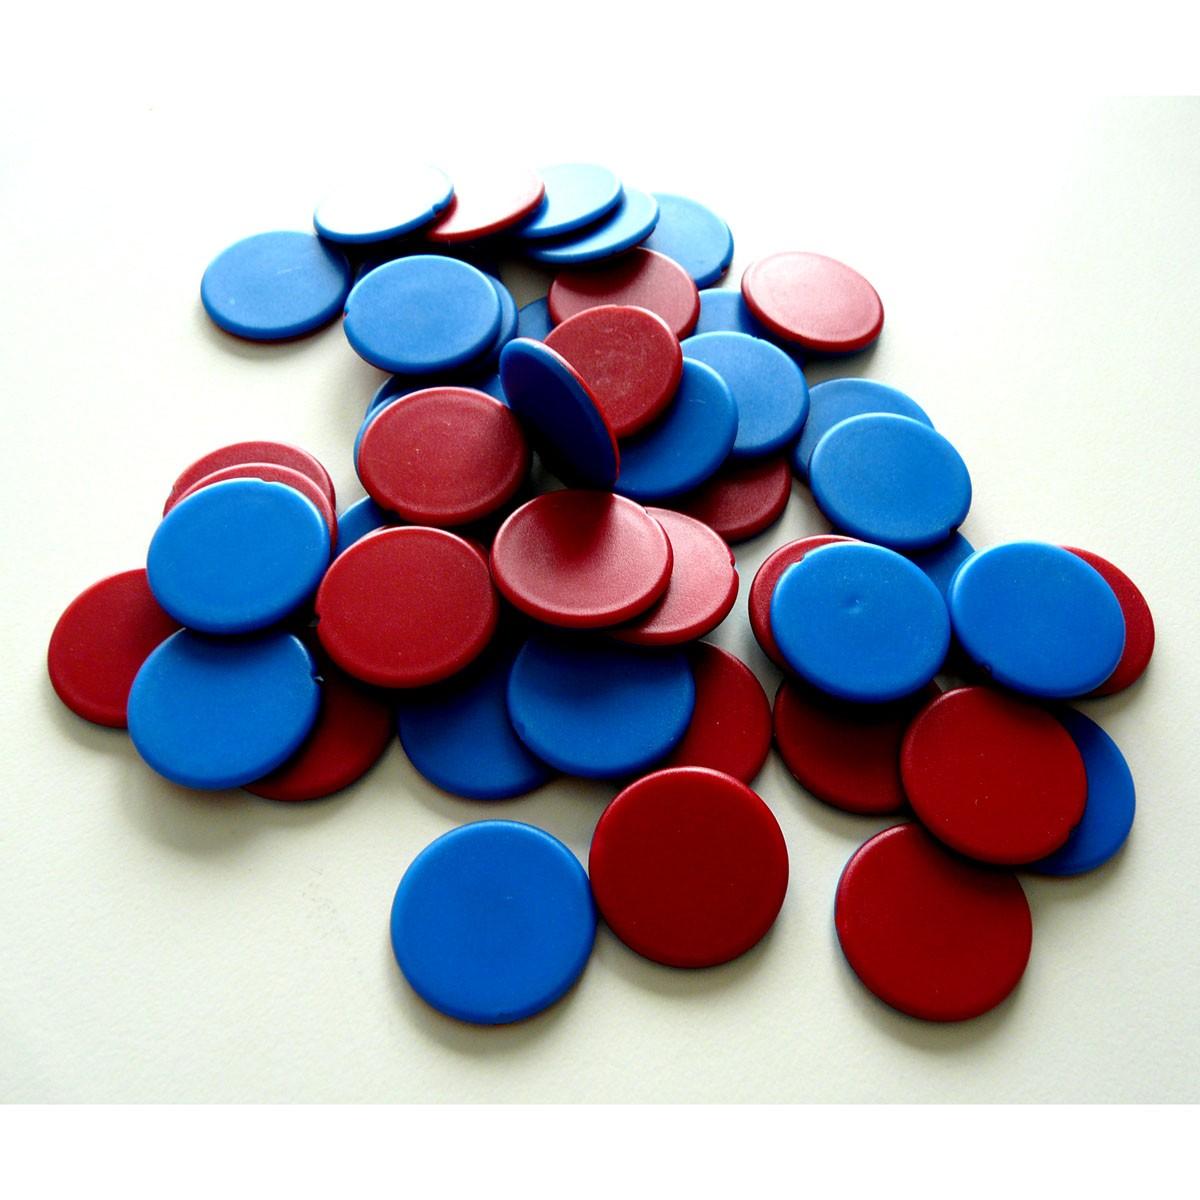 Counters tvåfärgade 50-pack